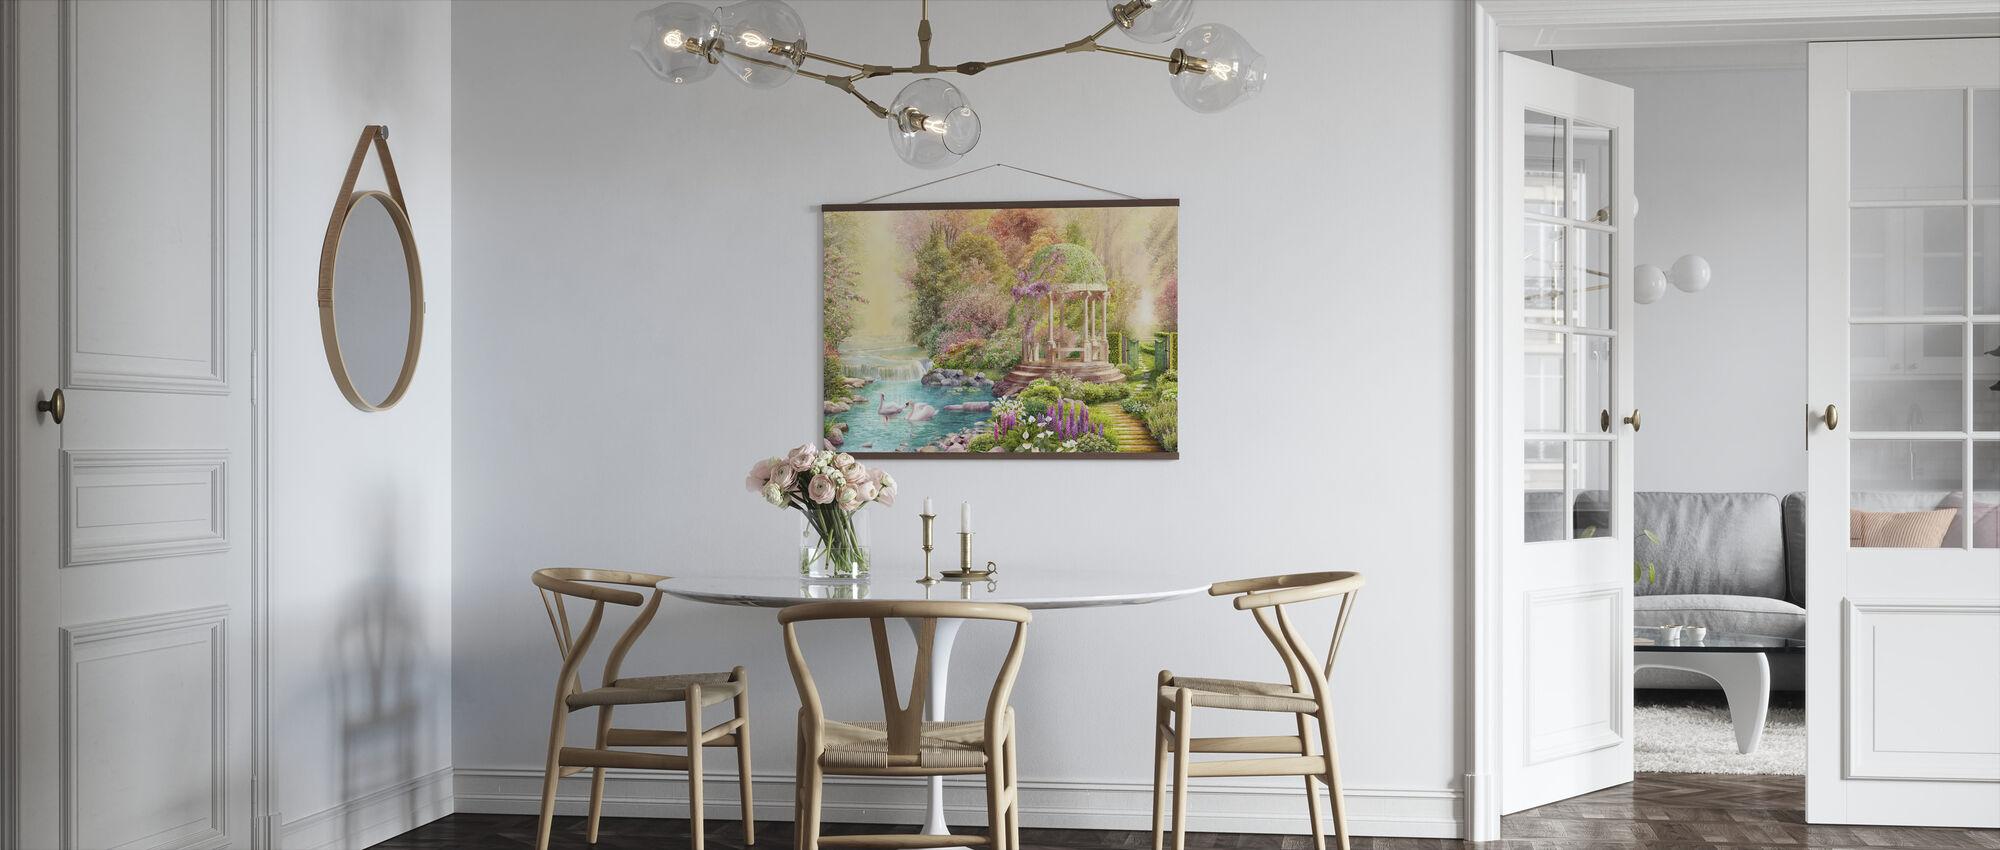 Swans Paradise - Poster - Kitchen